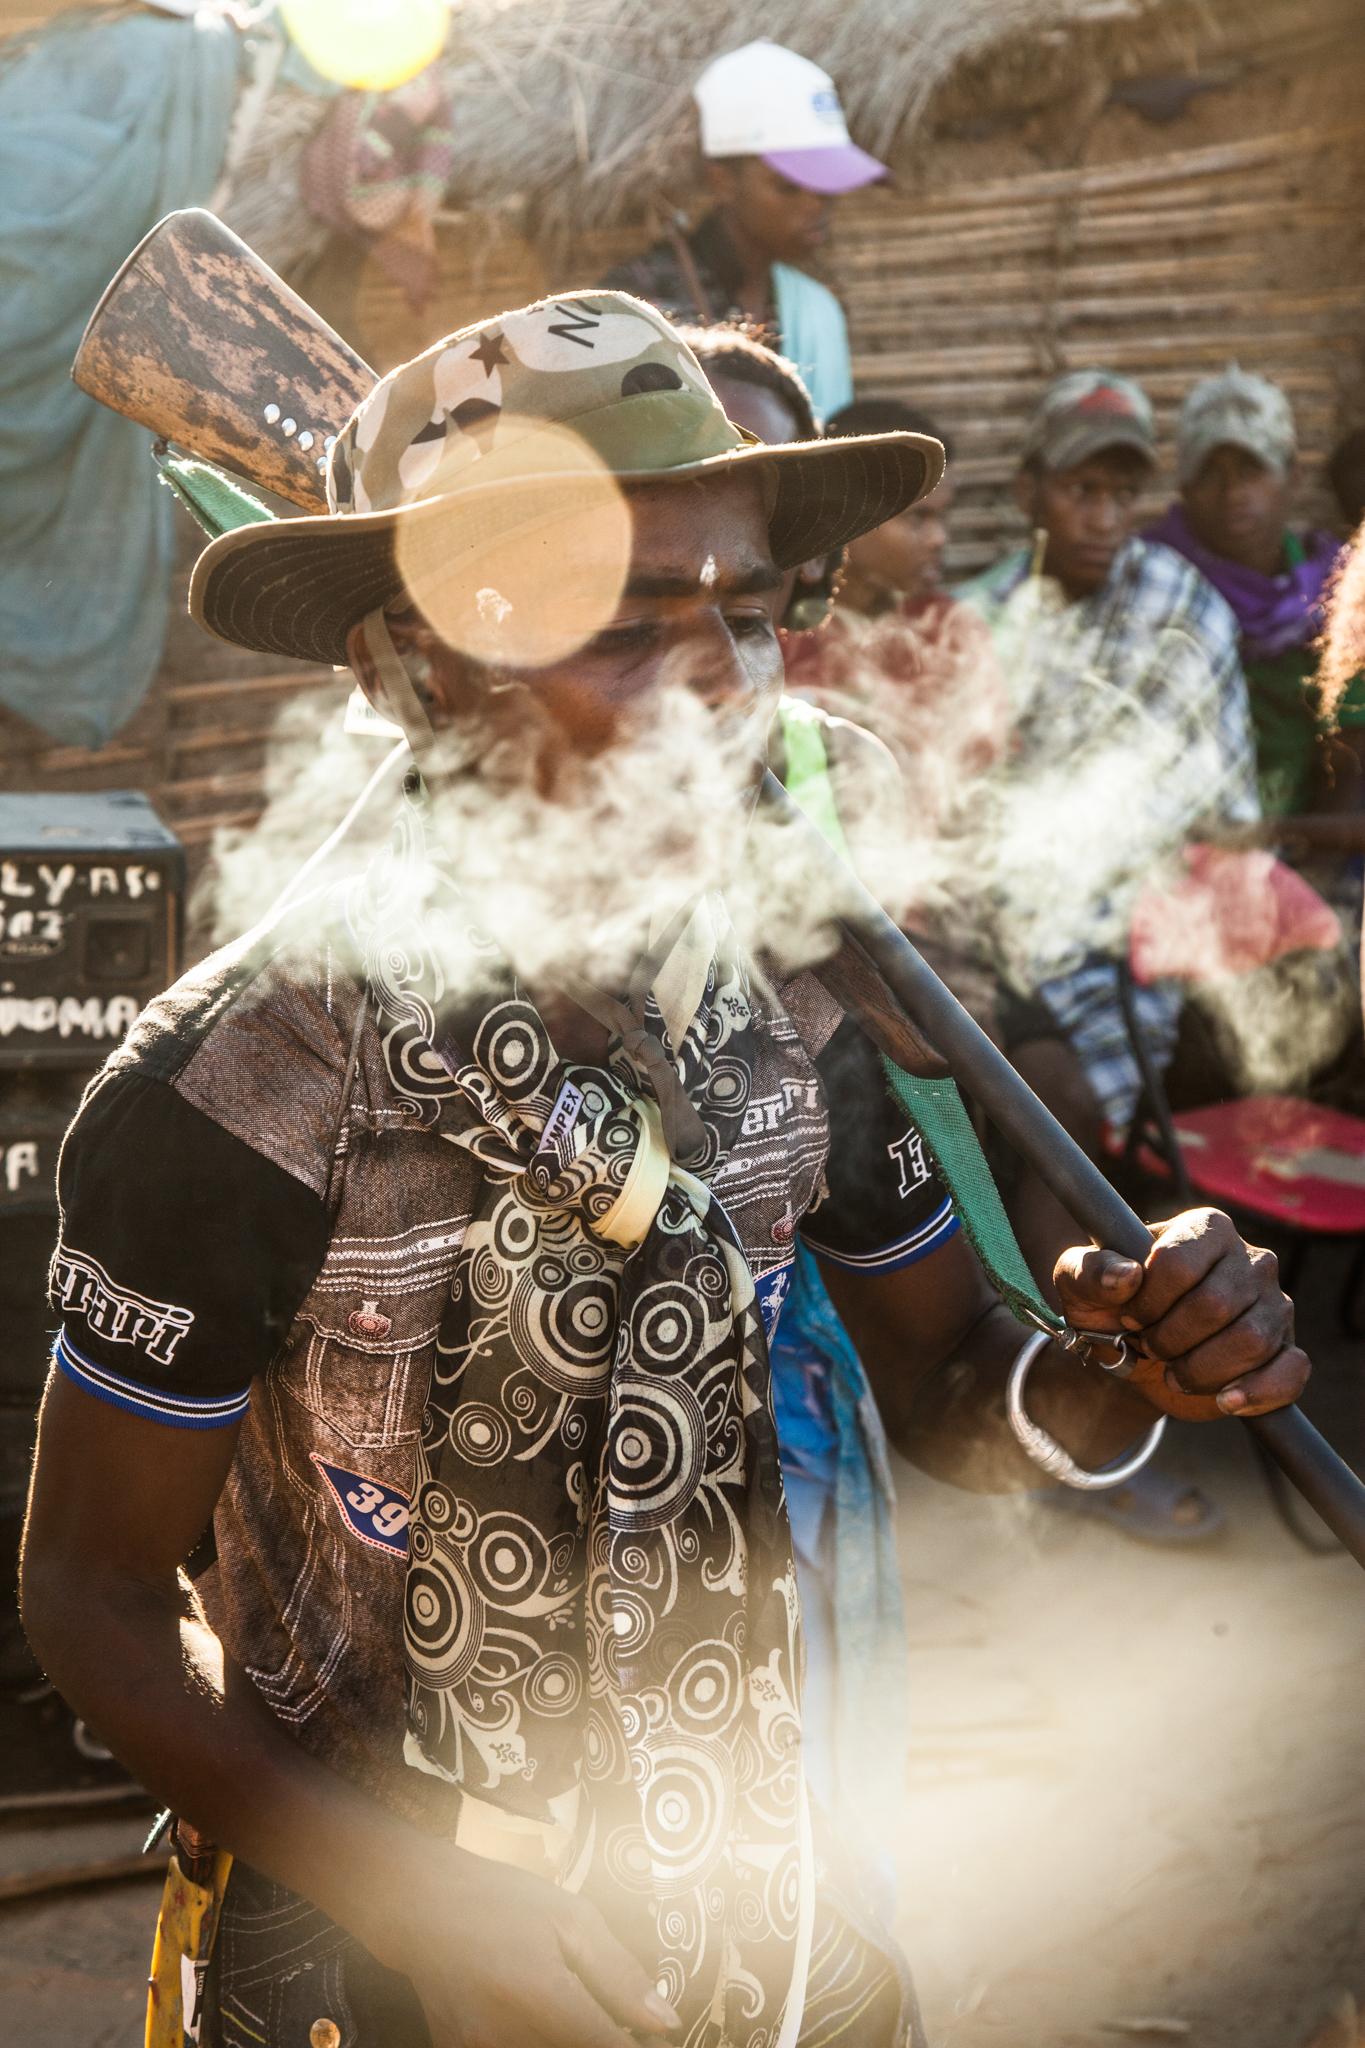 Kisoka (local tabacco) is more potent than cigarettes